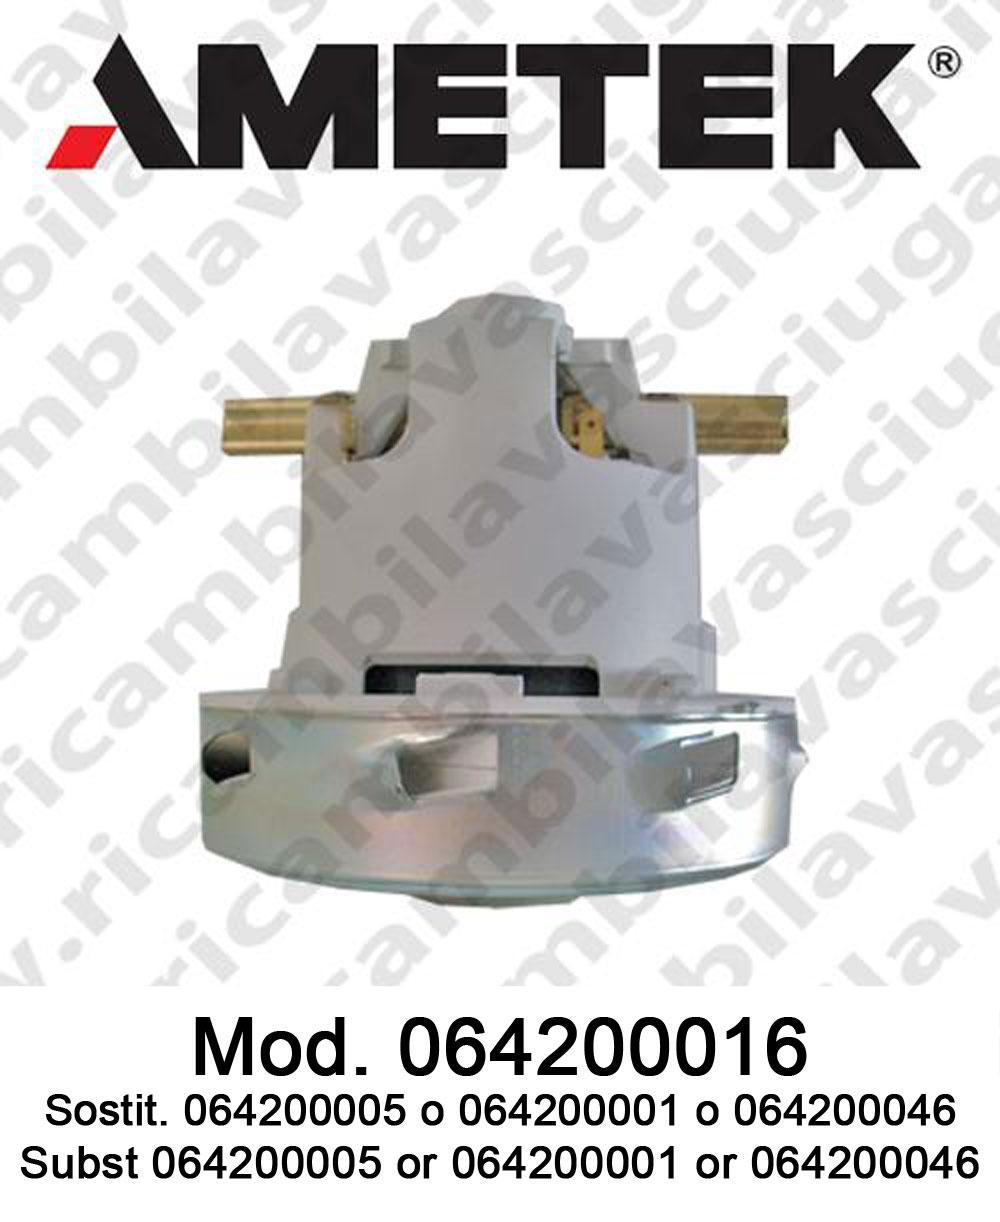 Vacuum motor 064200016 AMETEK ITALIA for scrubber dryer and vacuum cleaner. Replace 064200005 or 064200046 or 064200001